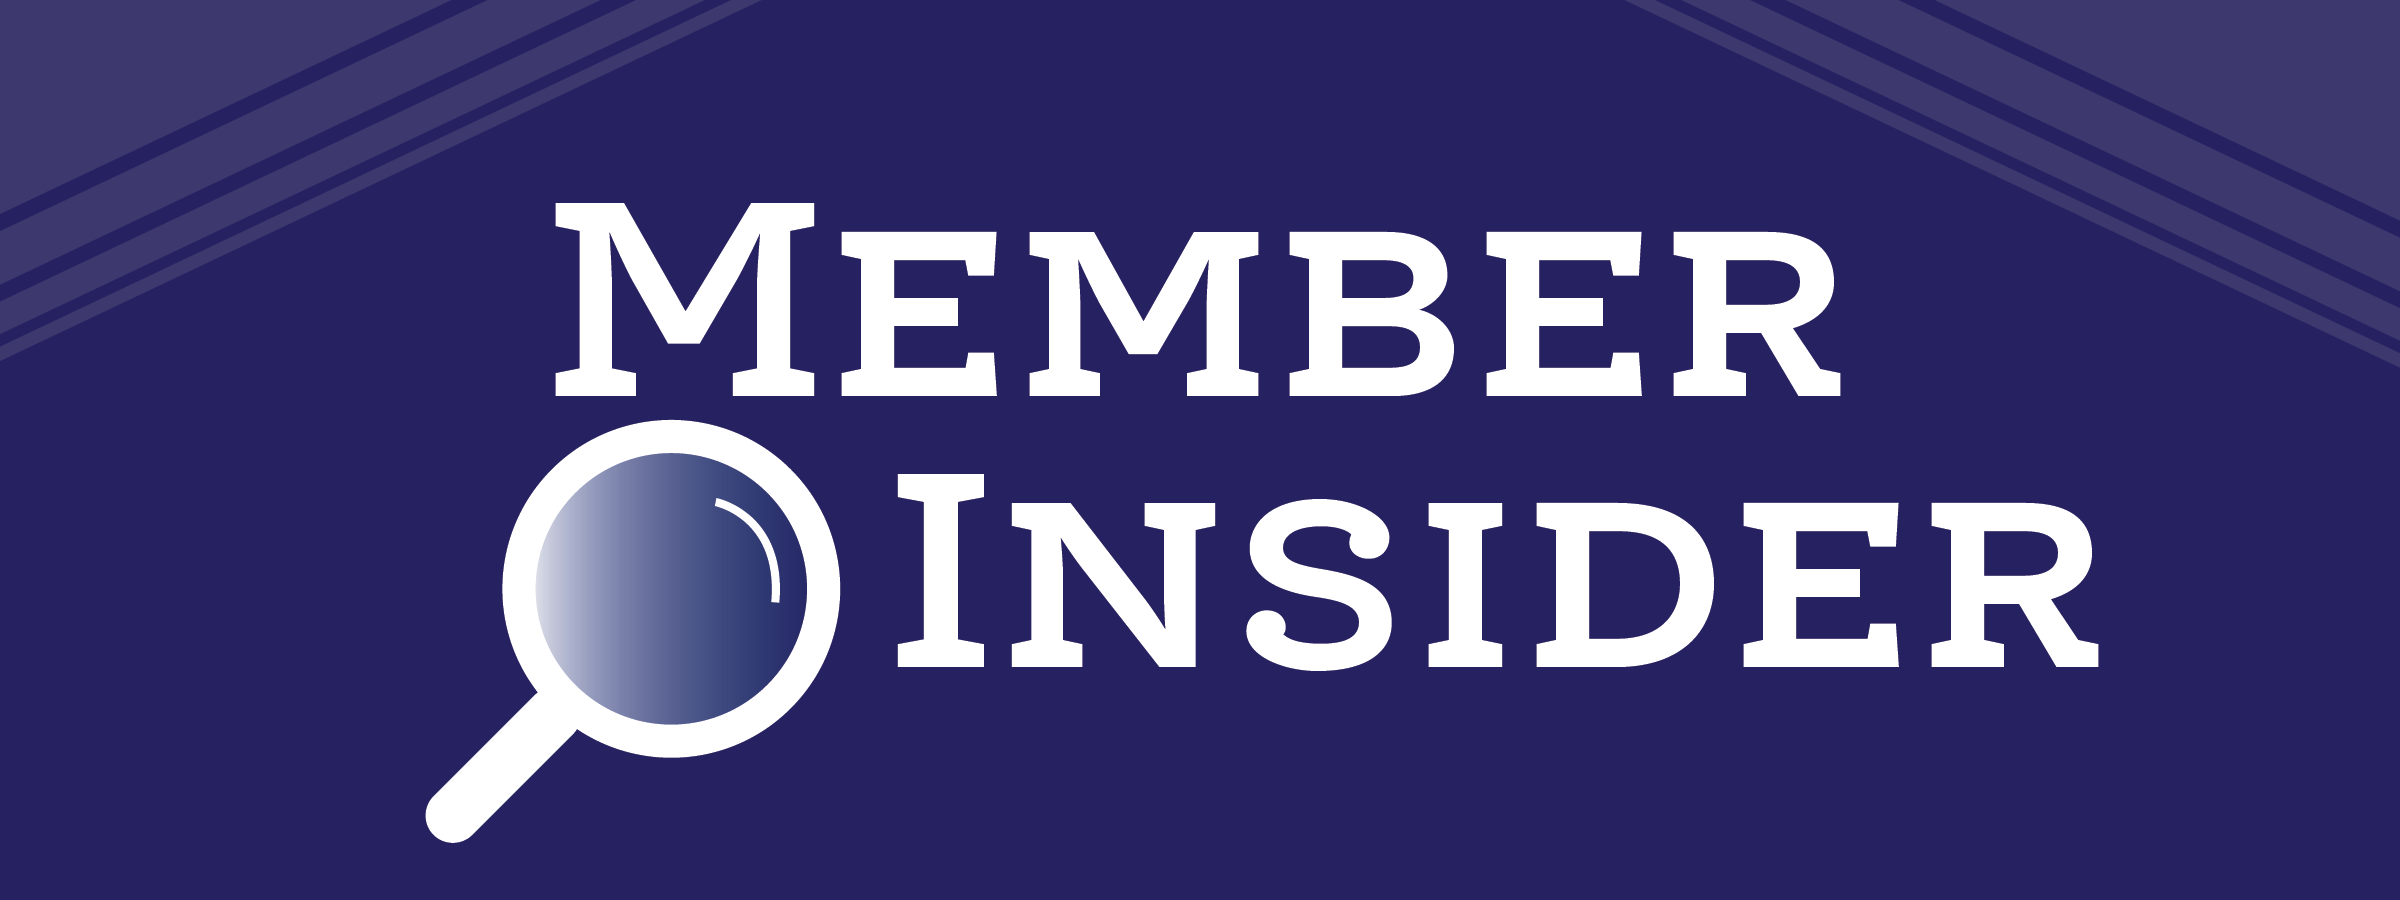 Image for Batavia Chamber Member Insider - Meet Nick Ninedorf